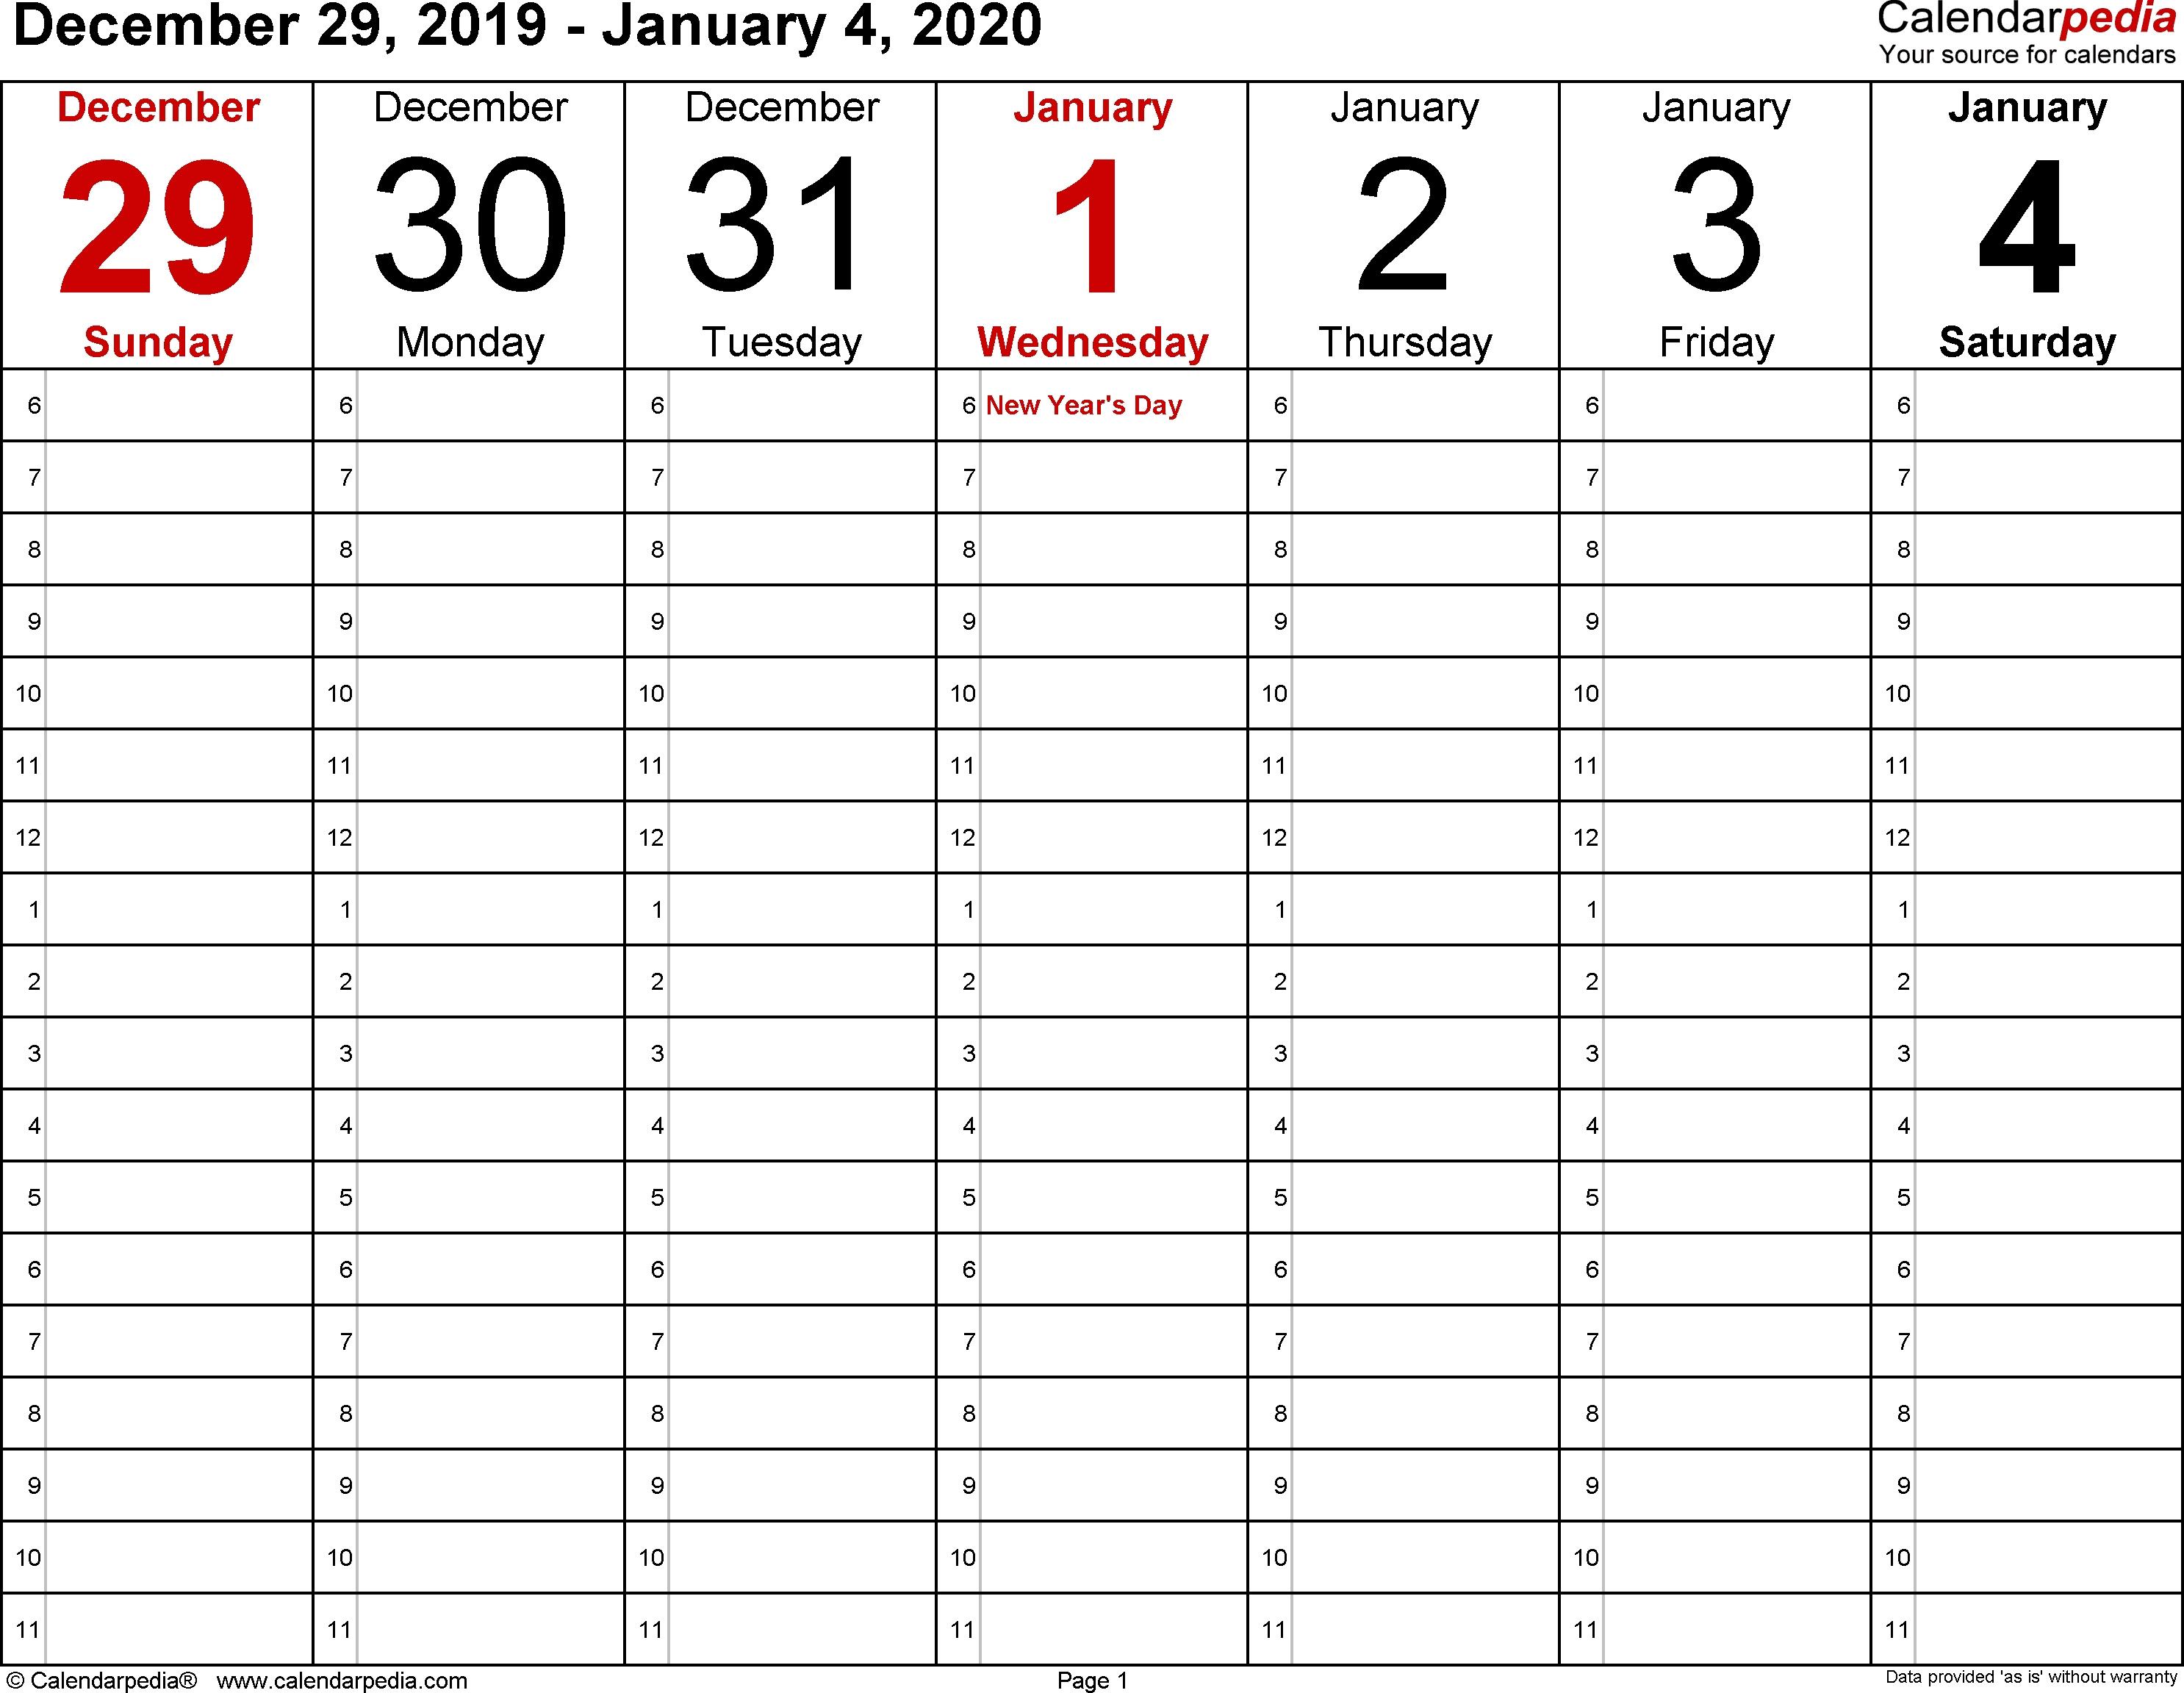 Weekly Calendar 2020 For Excel - 12 Free Printable Templates-2020 Bi Weekly Schedule Template Excel